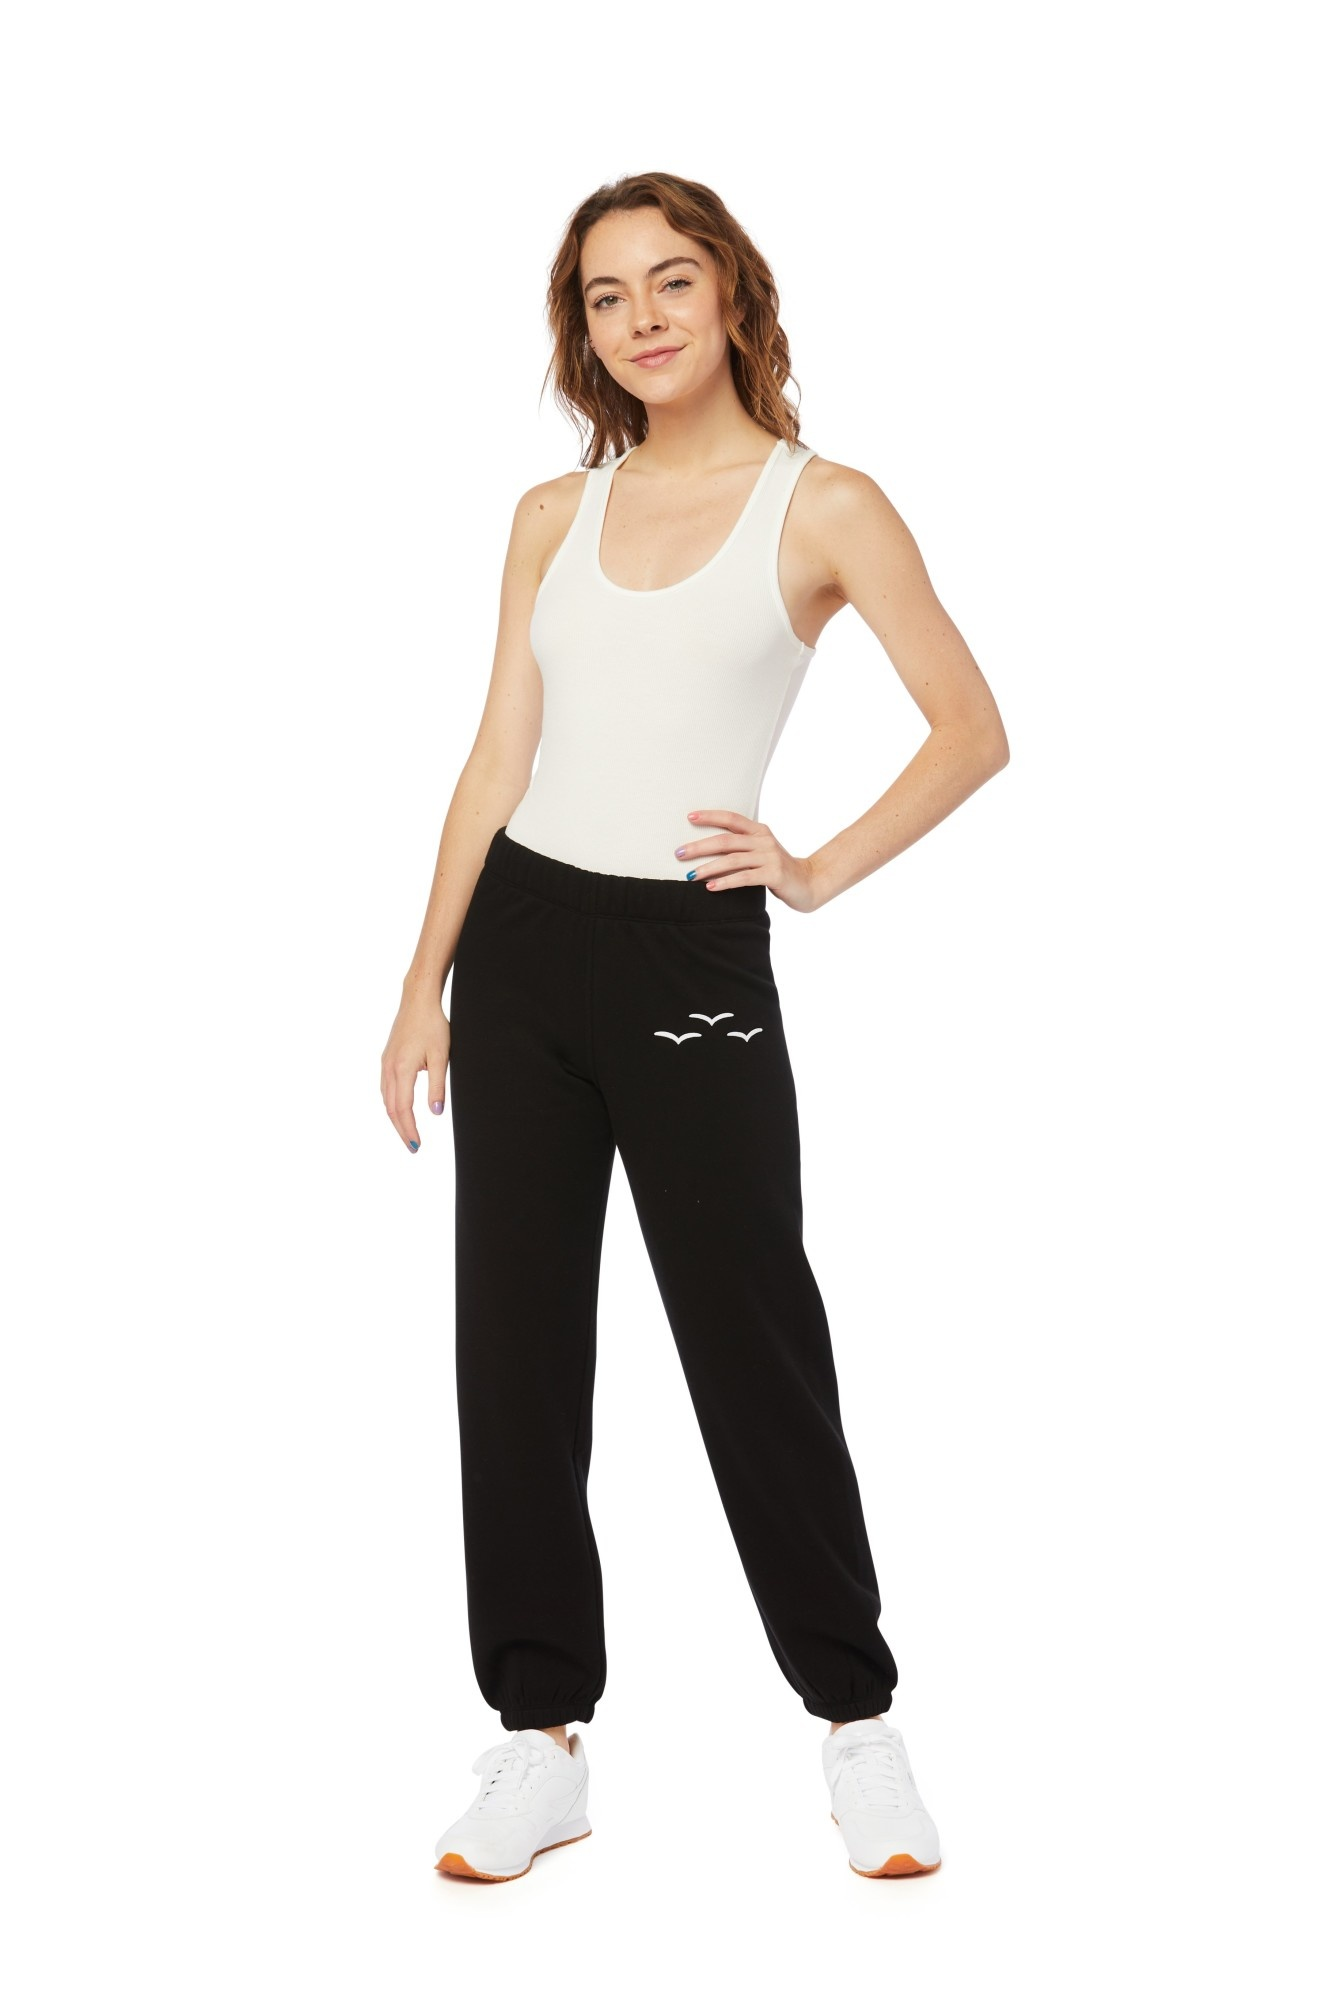 LAZYPANTS Niki Ultra Soft Sweatpants in Black